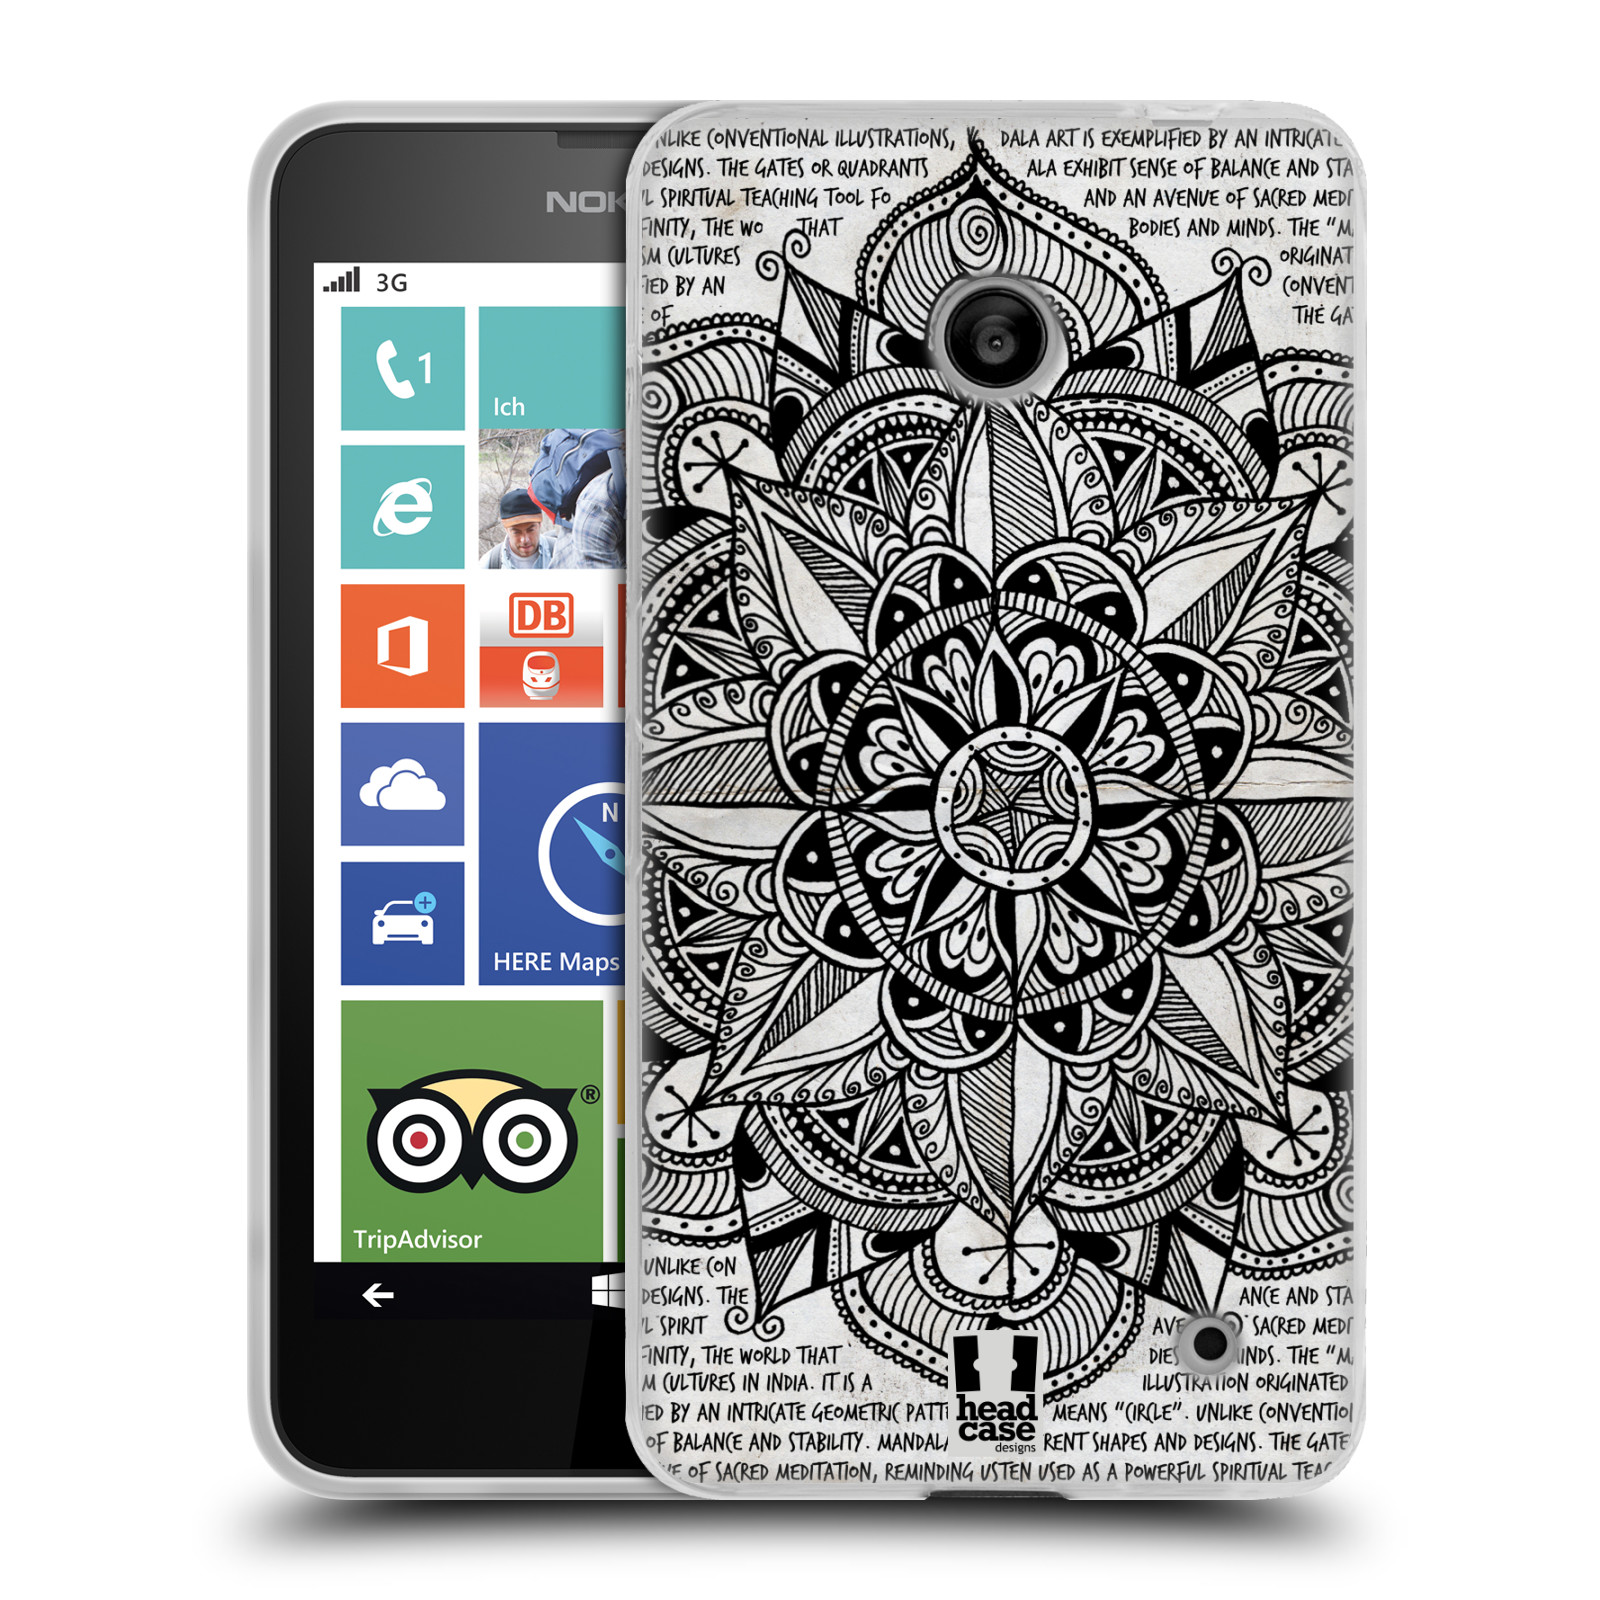 Silikonové pouzdro na mobil Nokia Lumia 635 HEAD CASE Mandala Doodle Paper (Silikonový kryt či obal na mobilní telefon Nokia Lumia 635 Dual SIM)